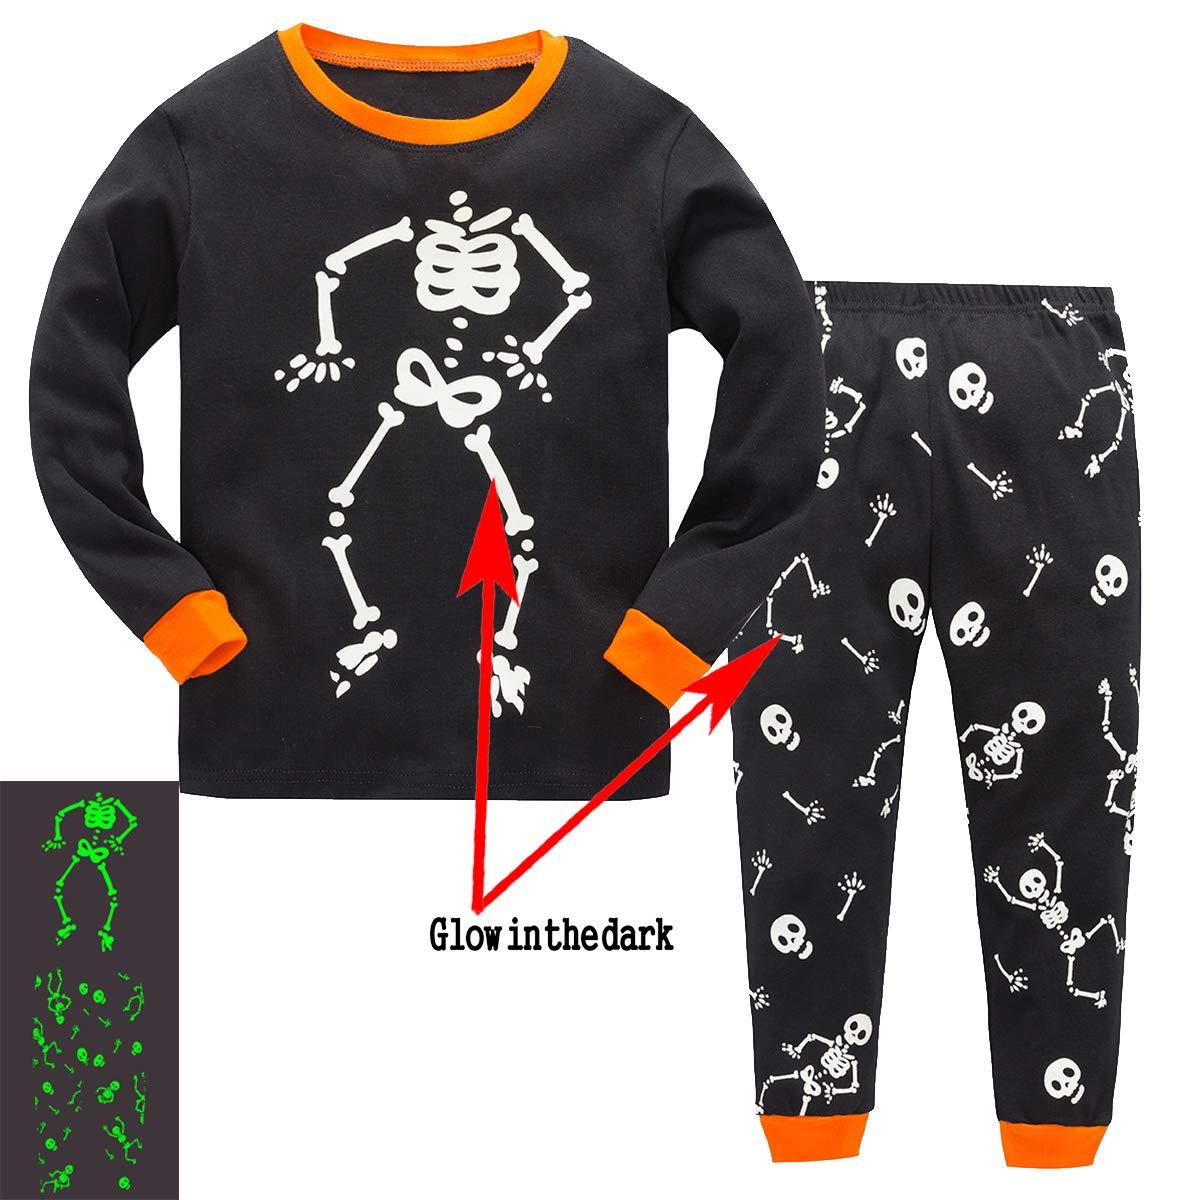 Toddler Boys Halloween Pajamas Skeleton Glow in The Dark Costumes Pjs